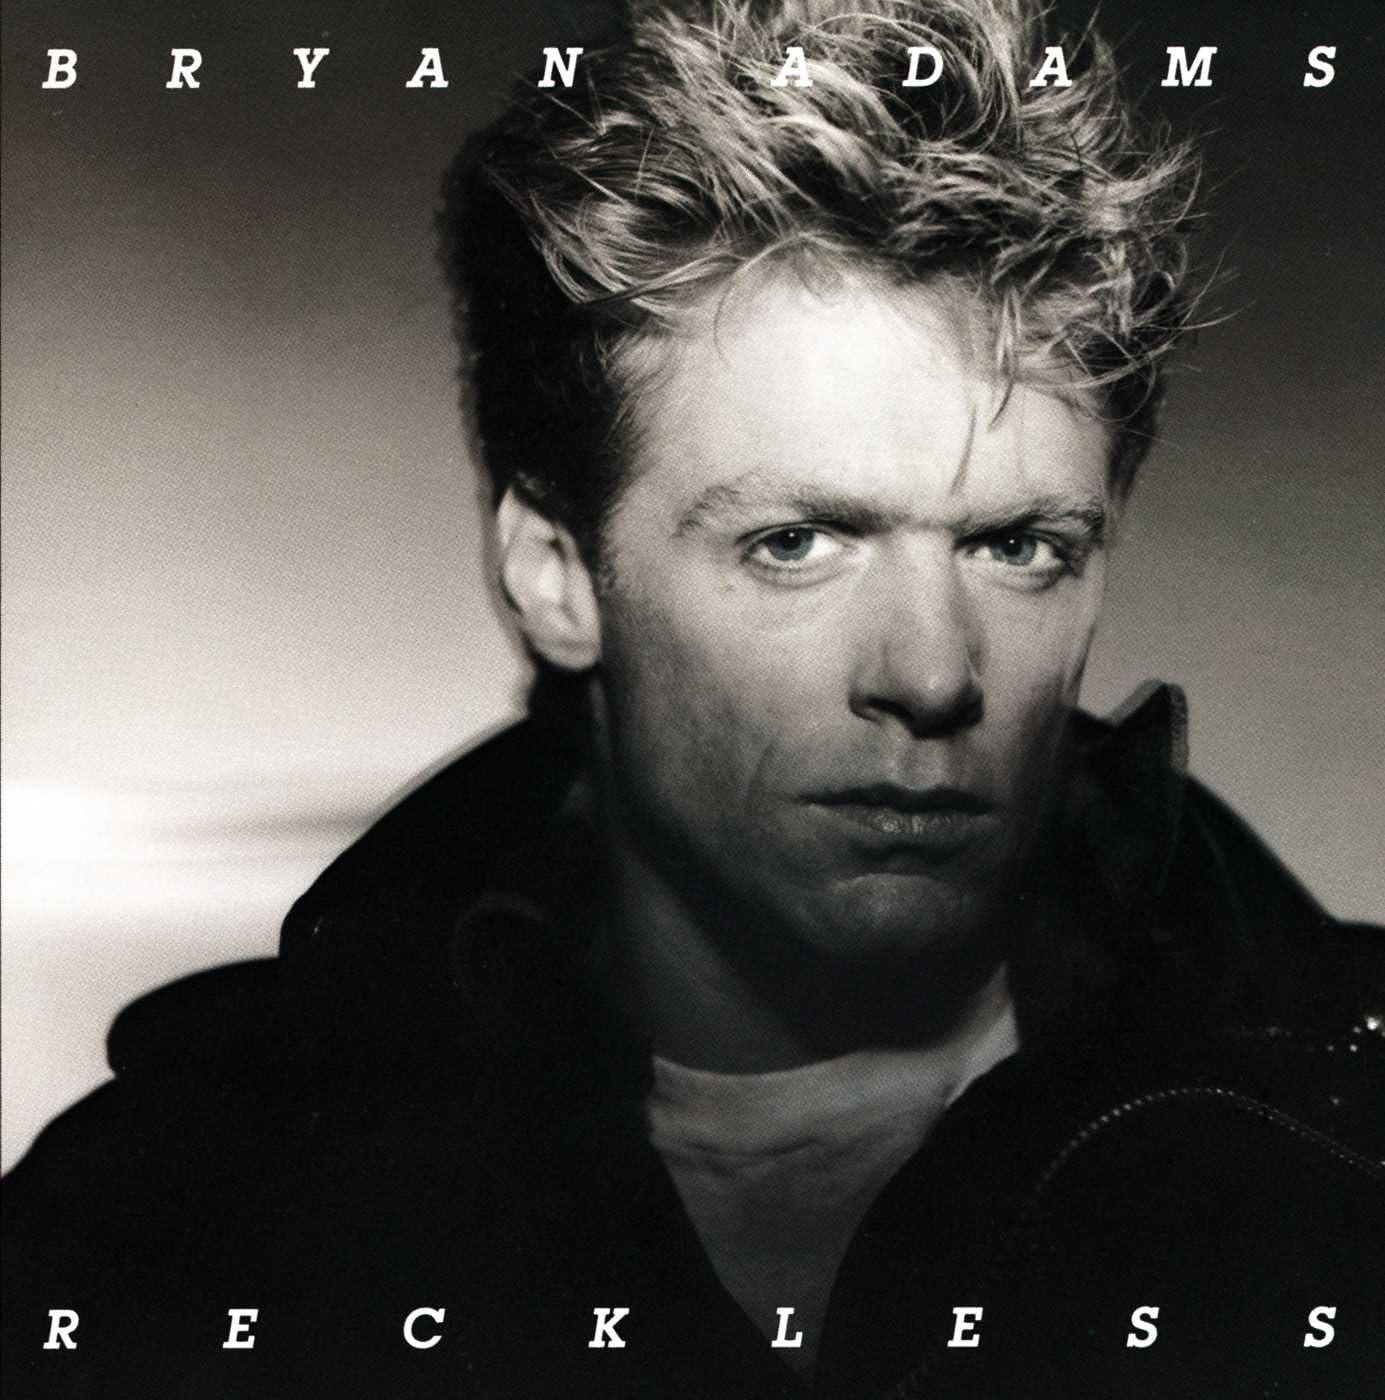 Reckless: Amazon.co.uk: Music